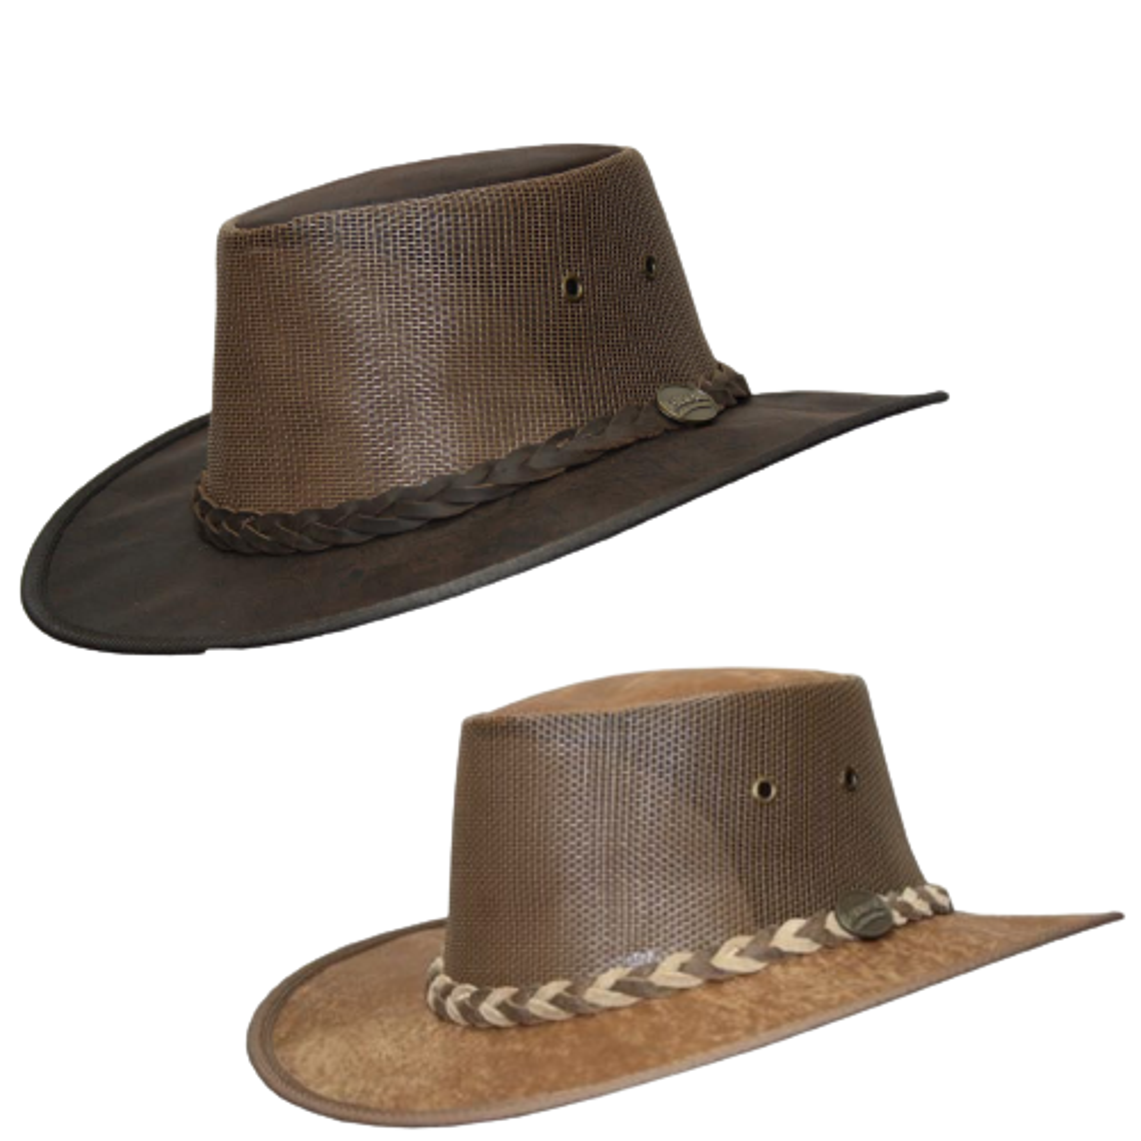 BARMAH Squashy Cooler Hat Kangaroo Leather OUTBACK Brim Foldable VENTED Mesh